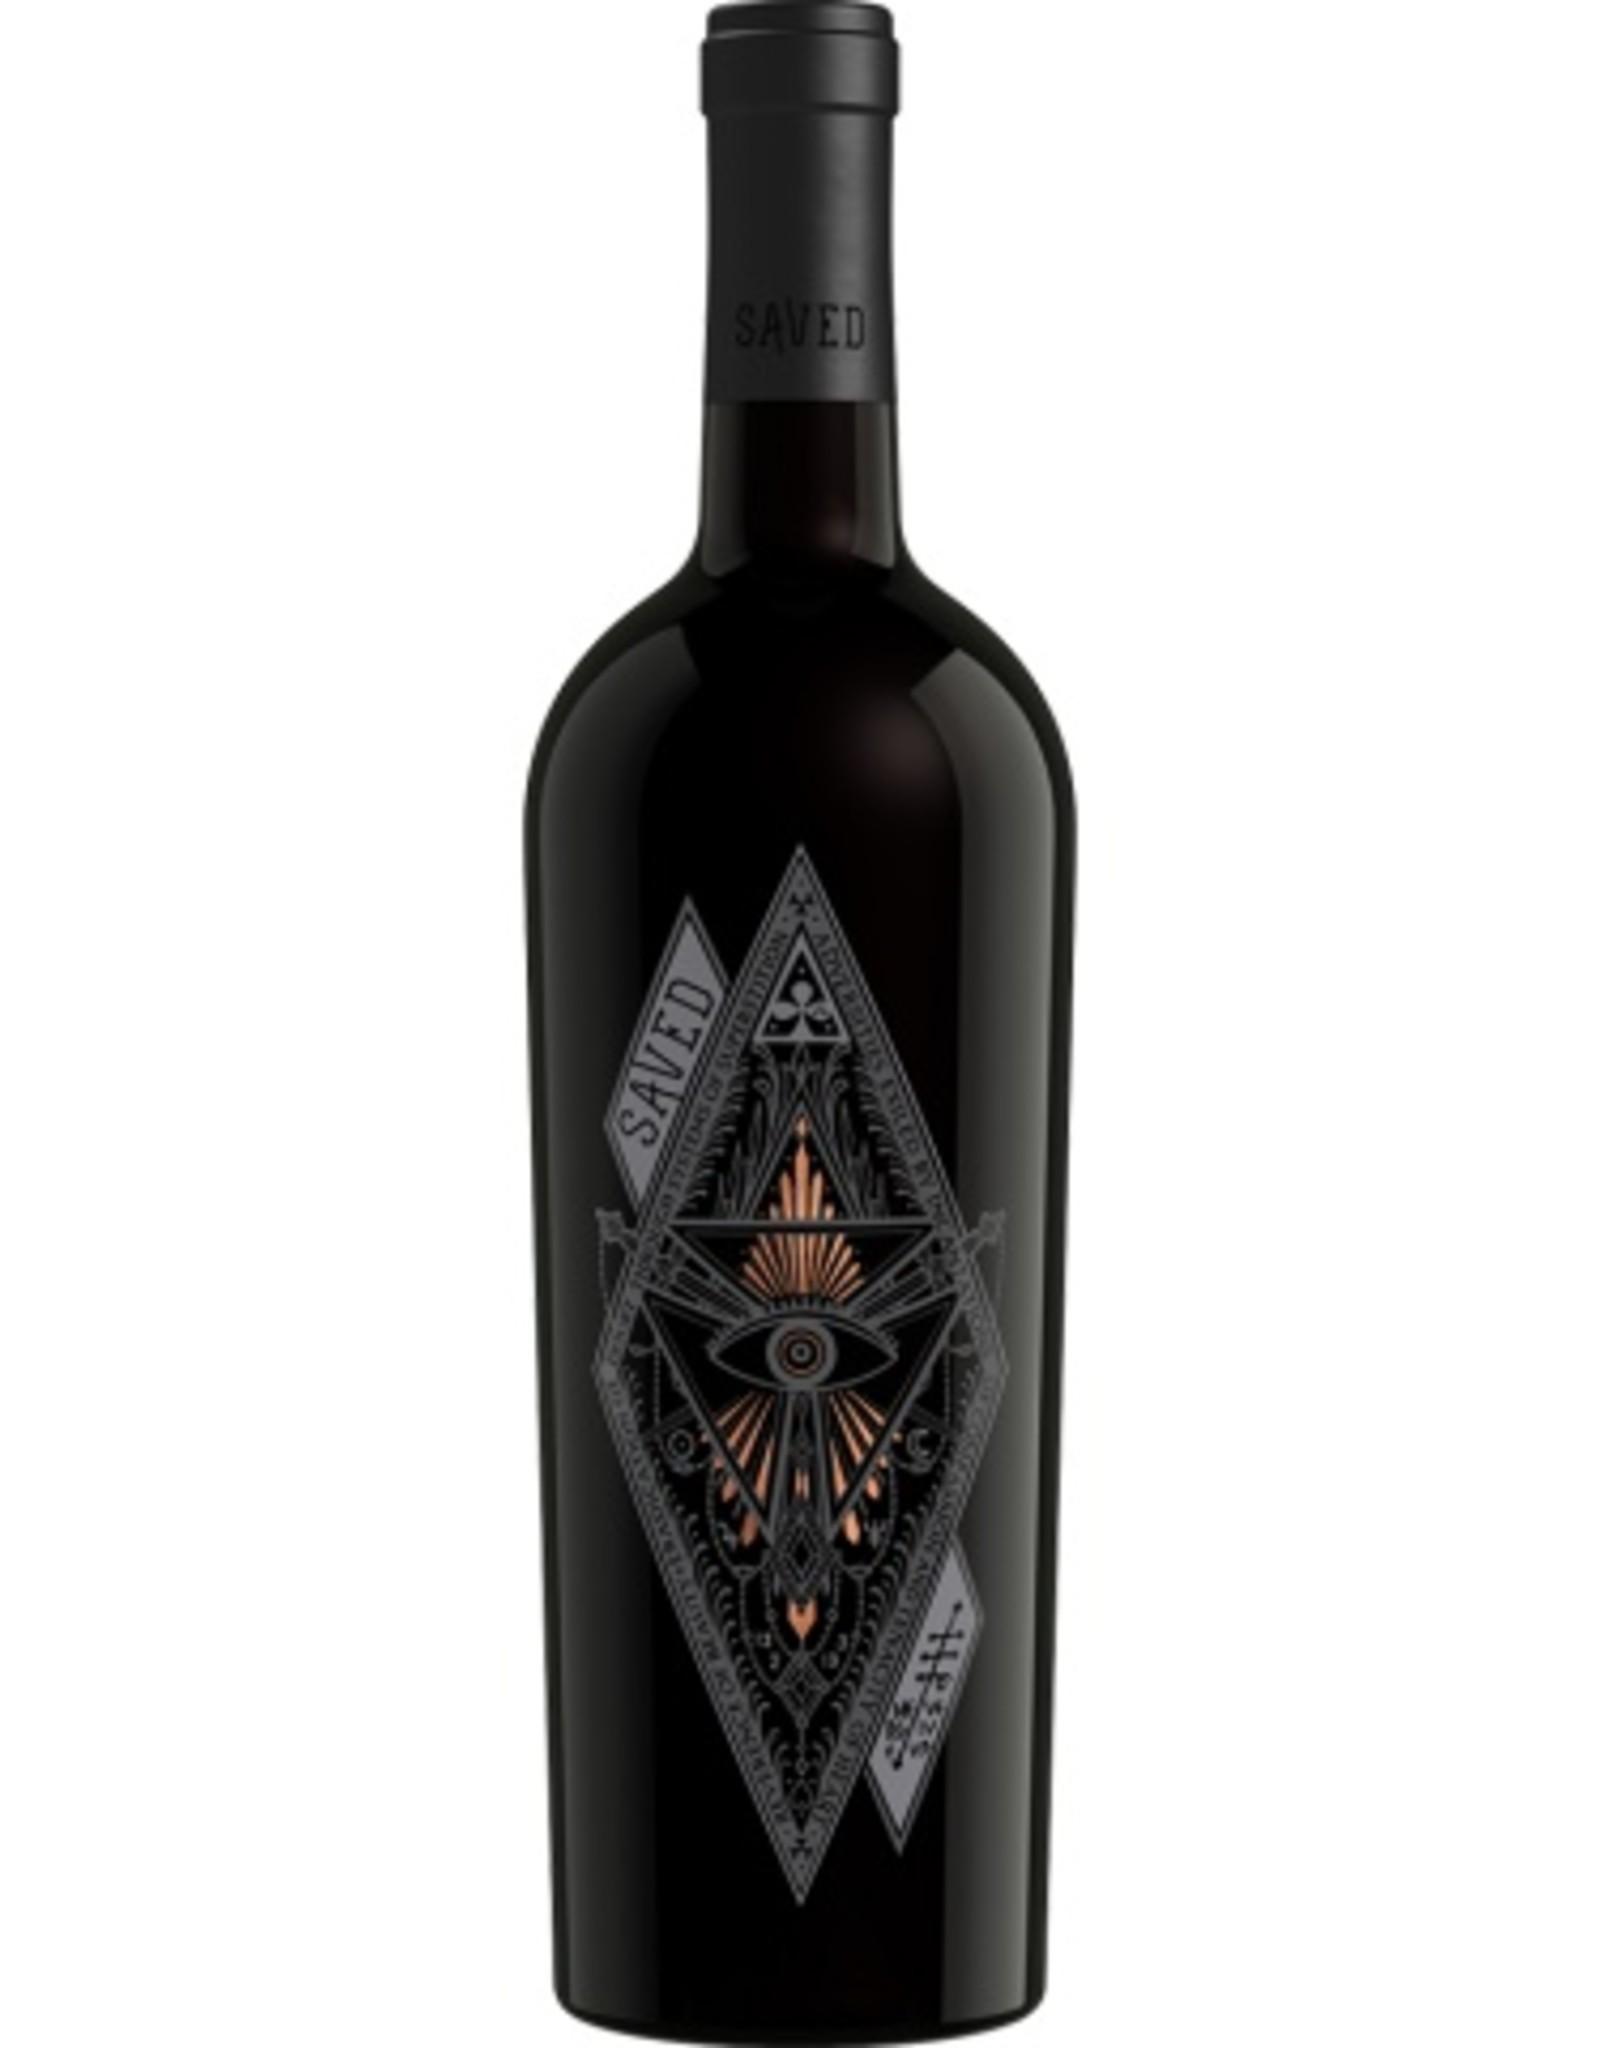 Red Wine 2016, Saved, Red Blend, Multi-regional Blend, Multiple AVA, California, 15.0% Alc, TW90